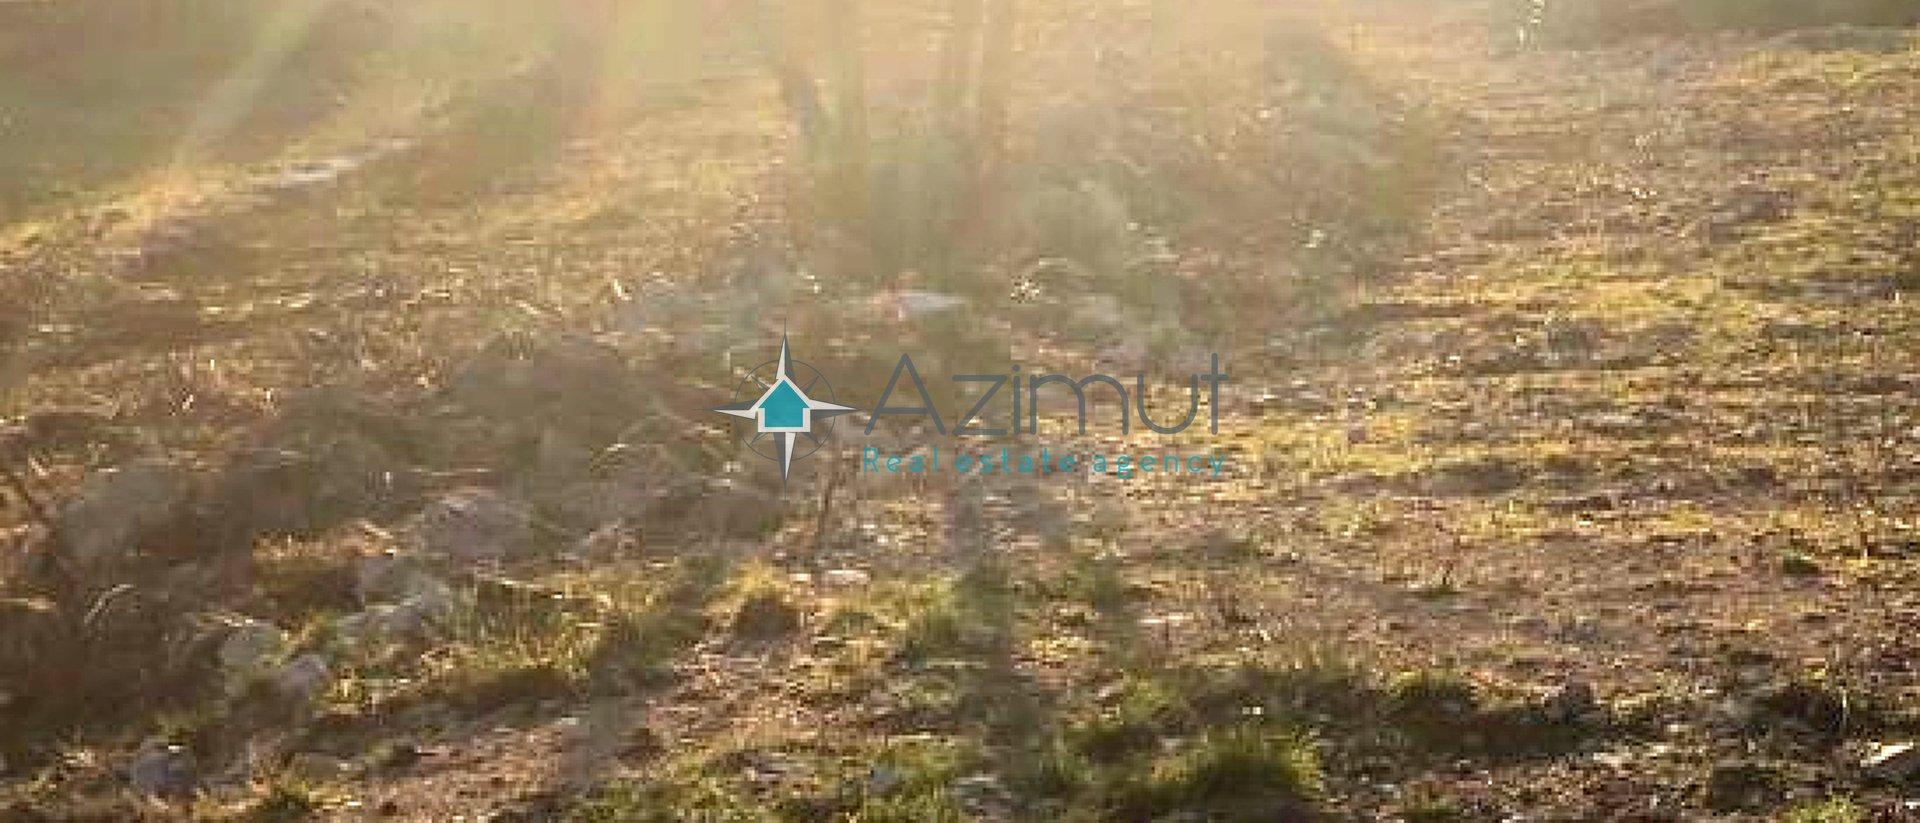 Viškovo - Mavri, građevinsko zemljište, 900m2